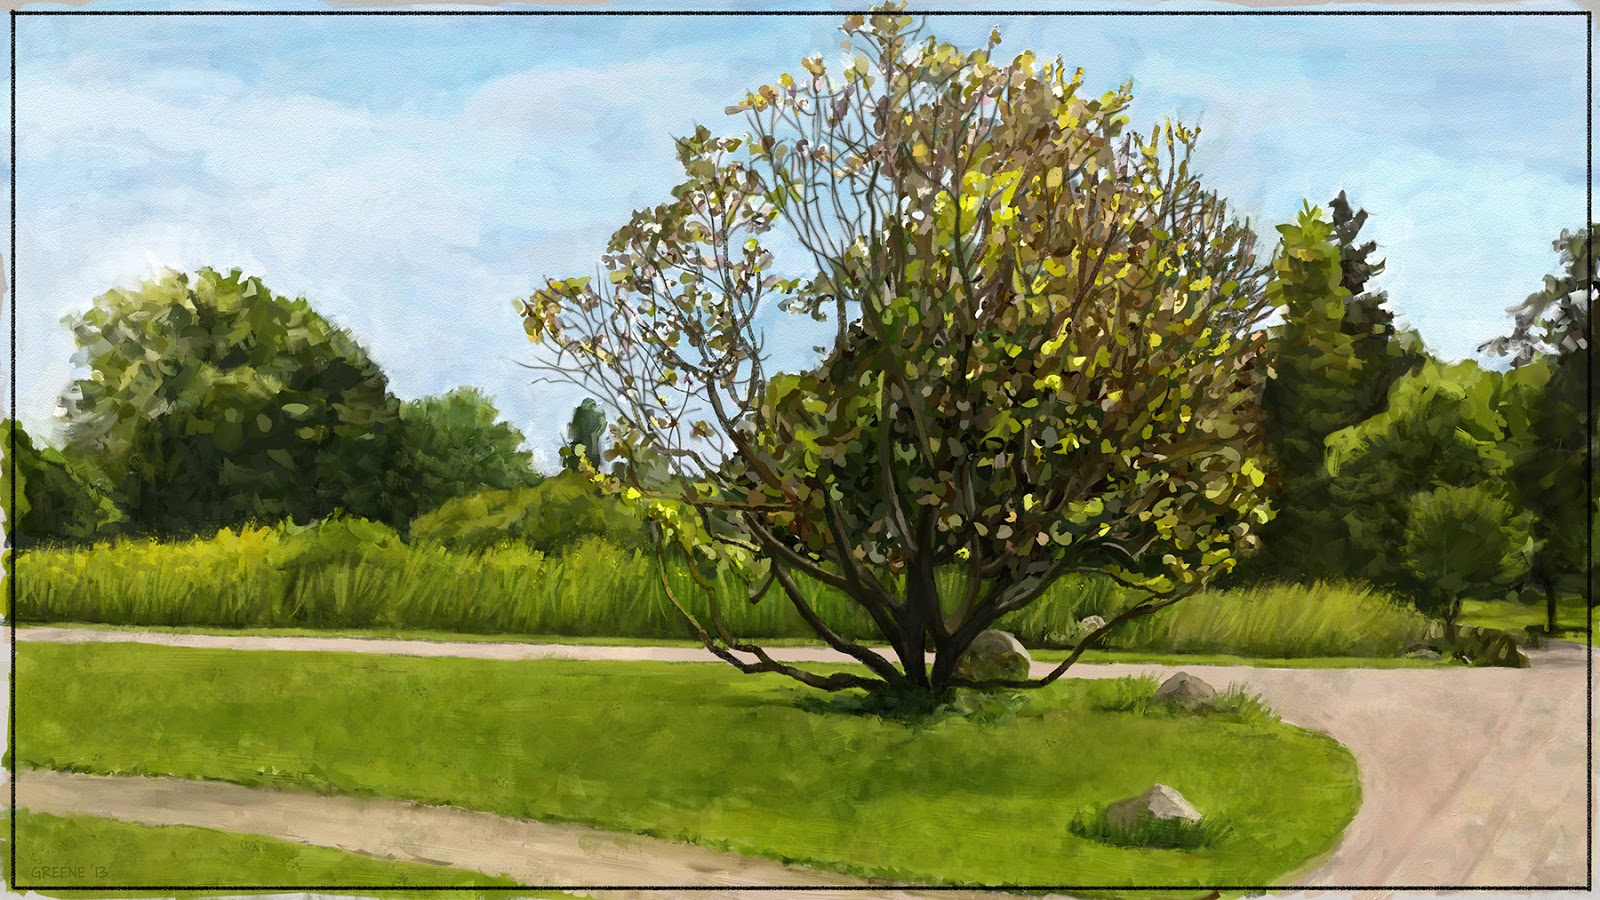 Botanical gardens md the world s catalog of ideas for Botanical gardens maryland